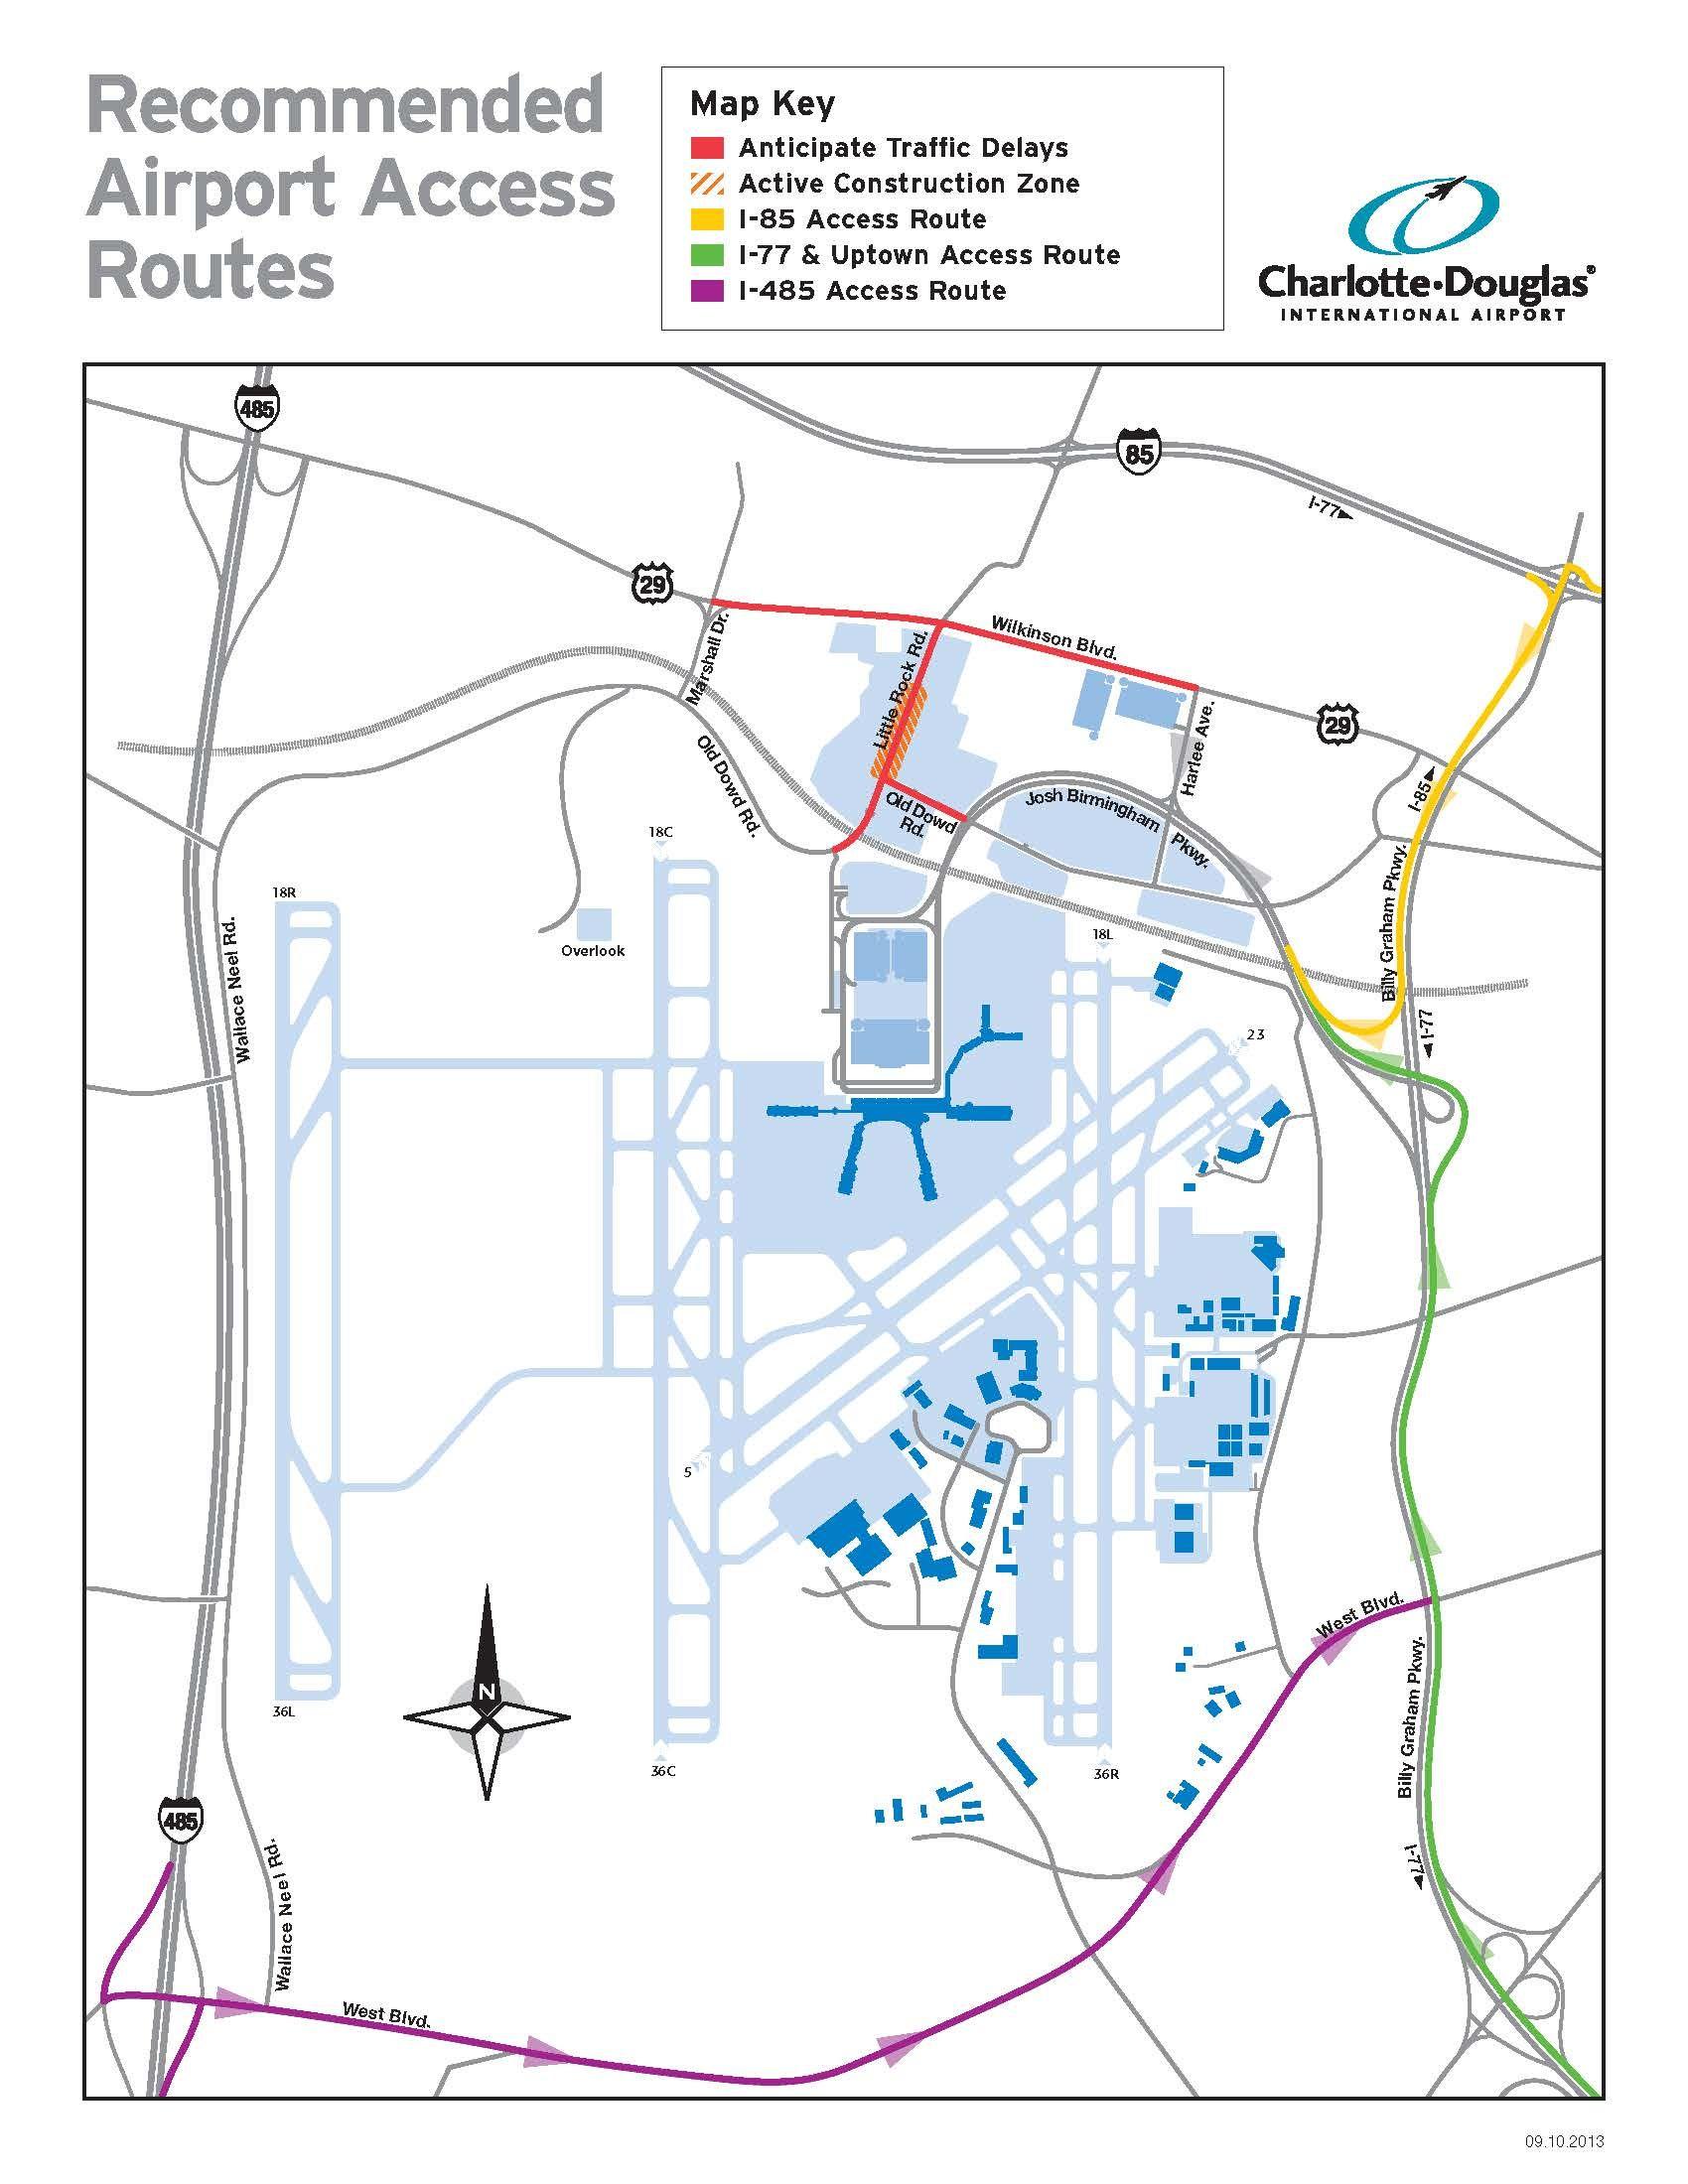 Charlotte Airport Maps Directions San Francisco Pinterest City